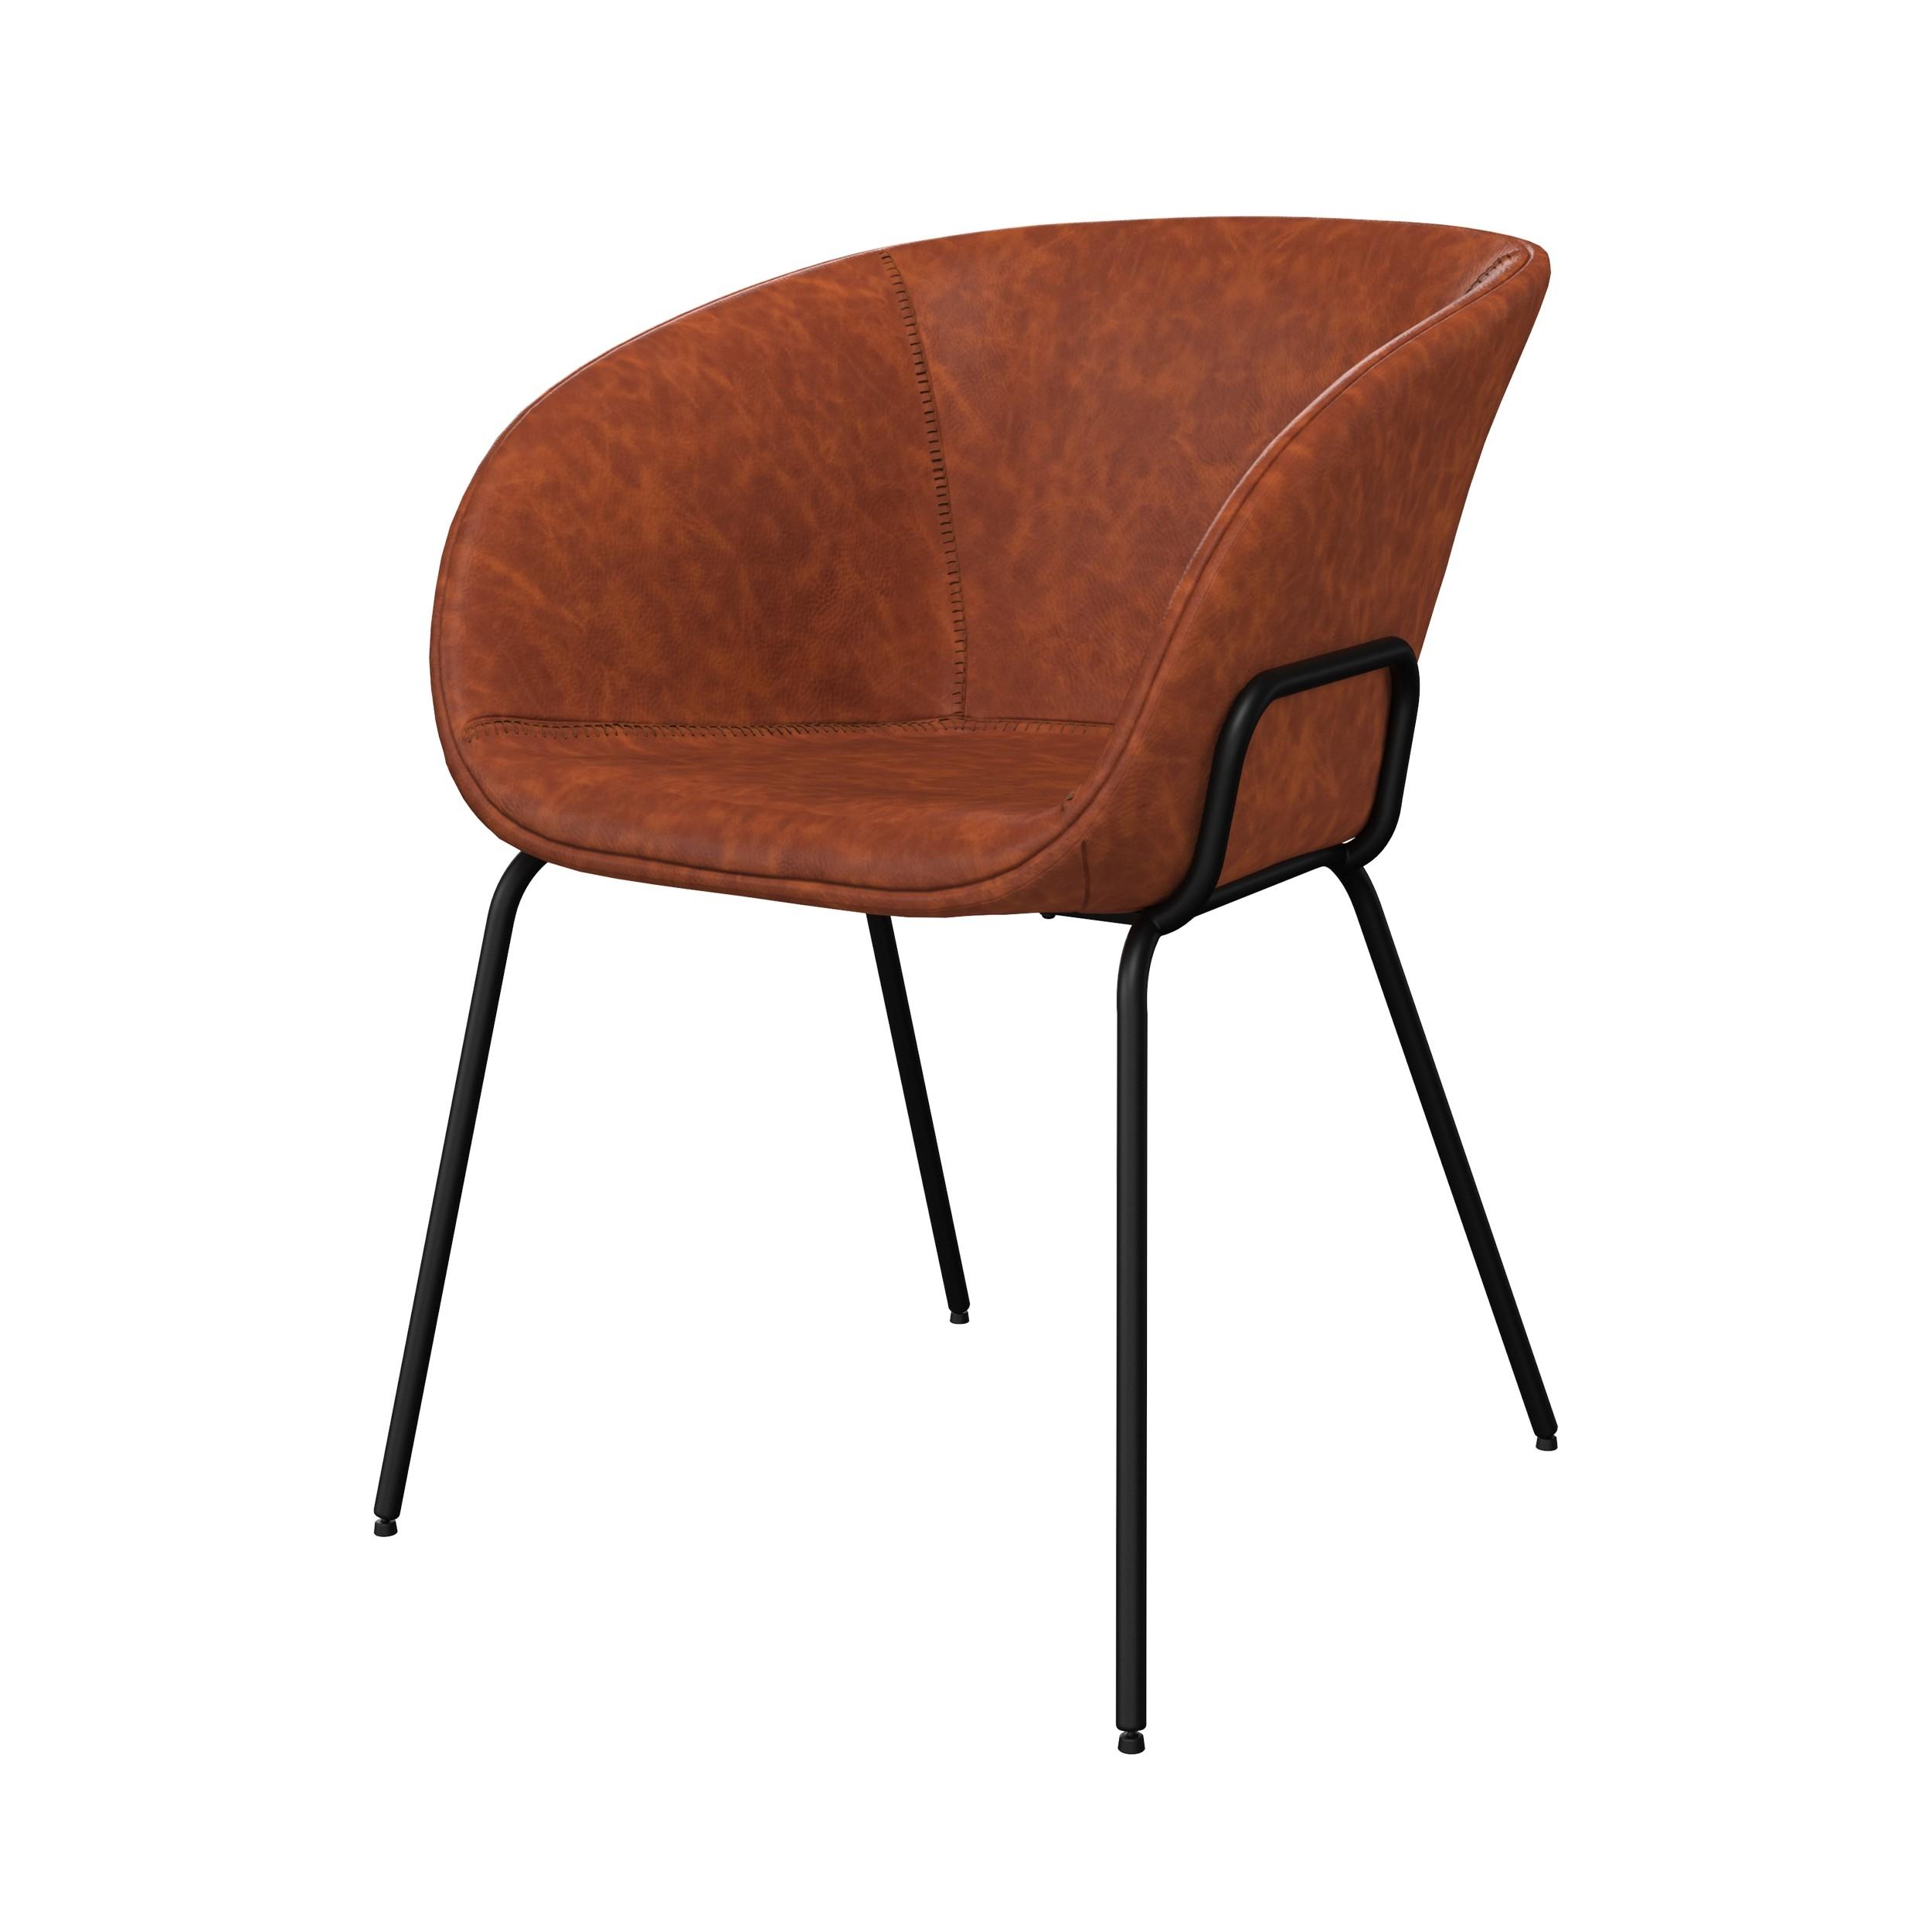 acheter chaise en cuir synthetique marron